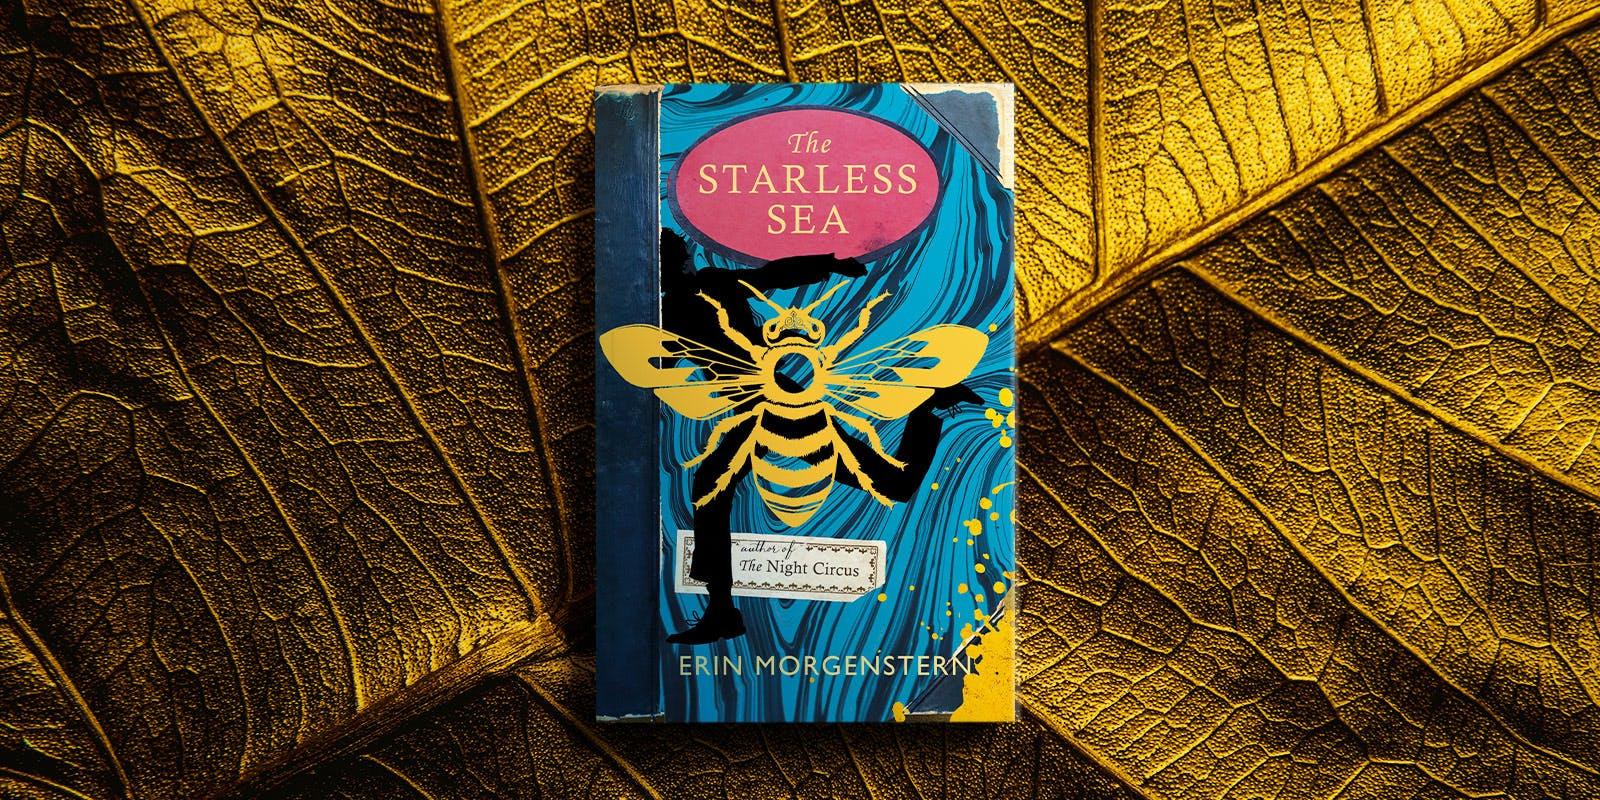 The Starless Sea quiz